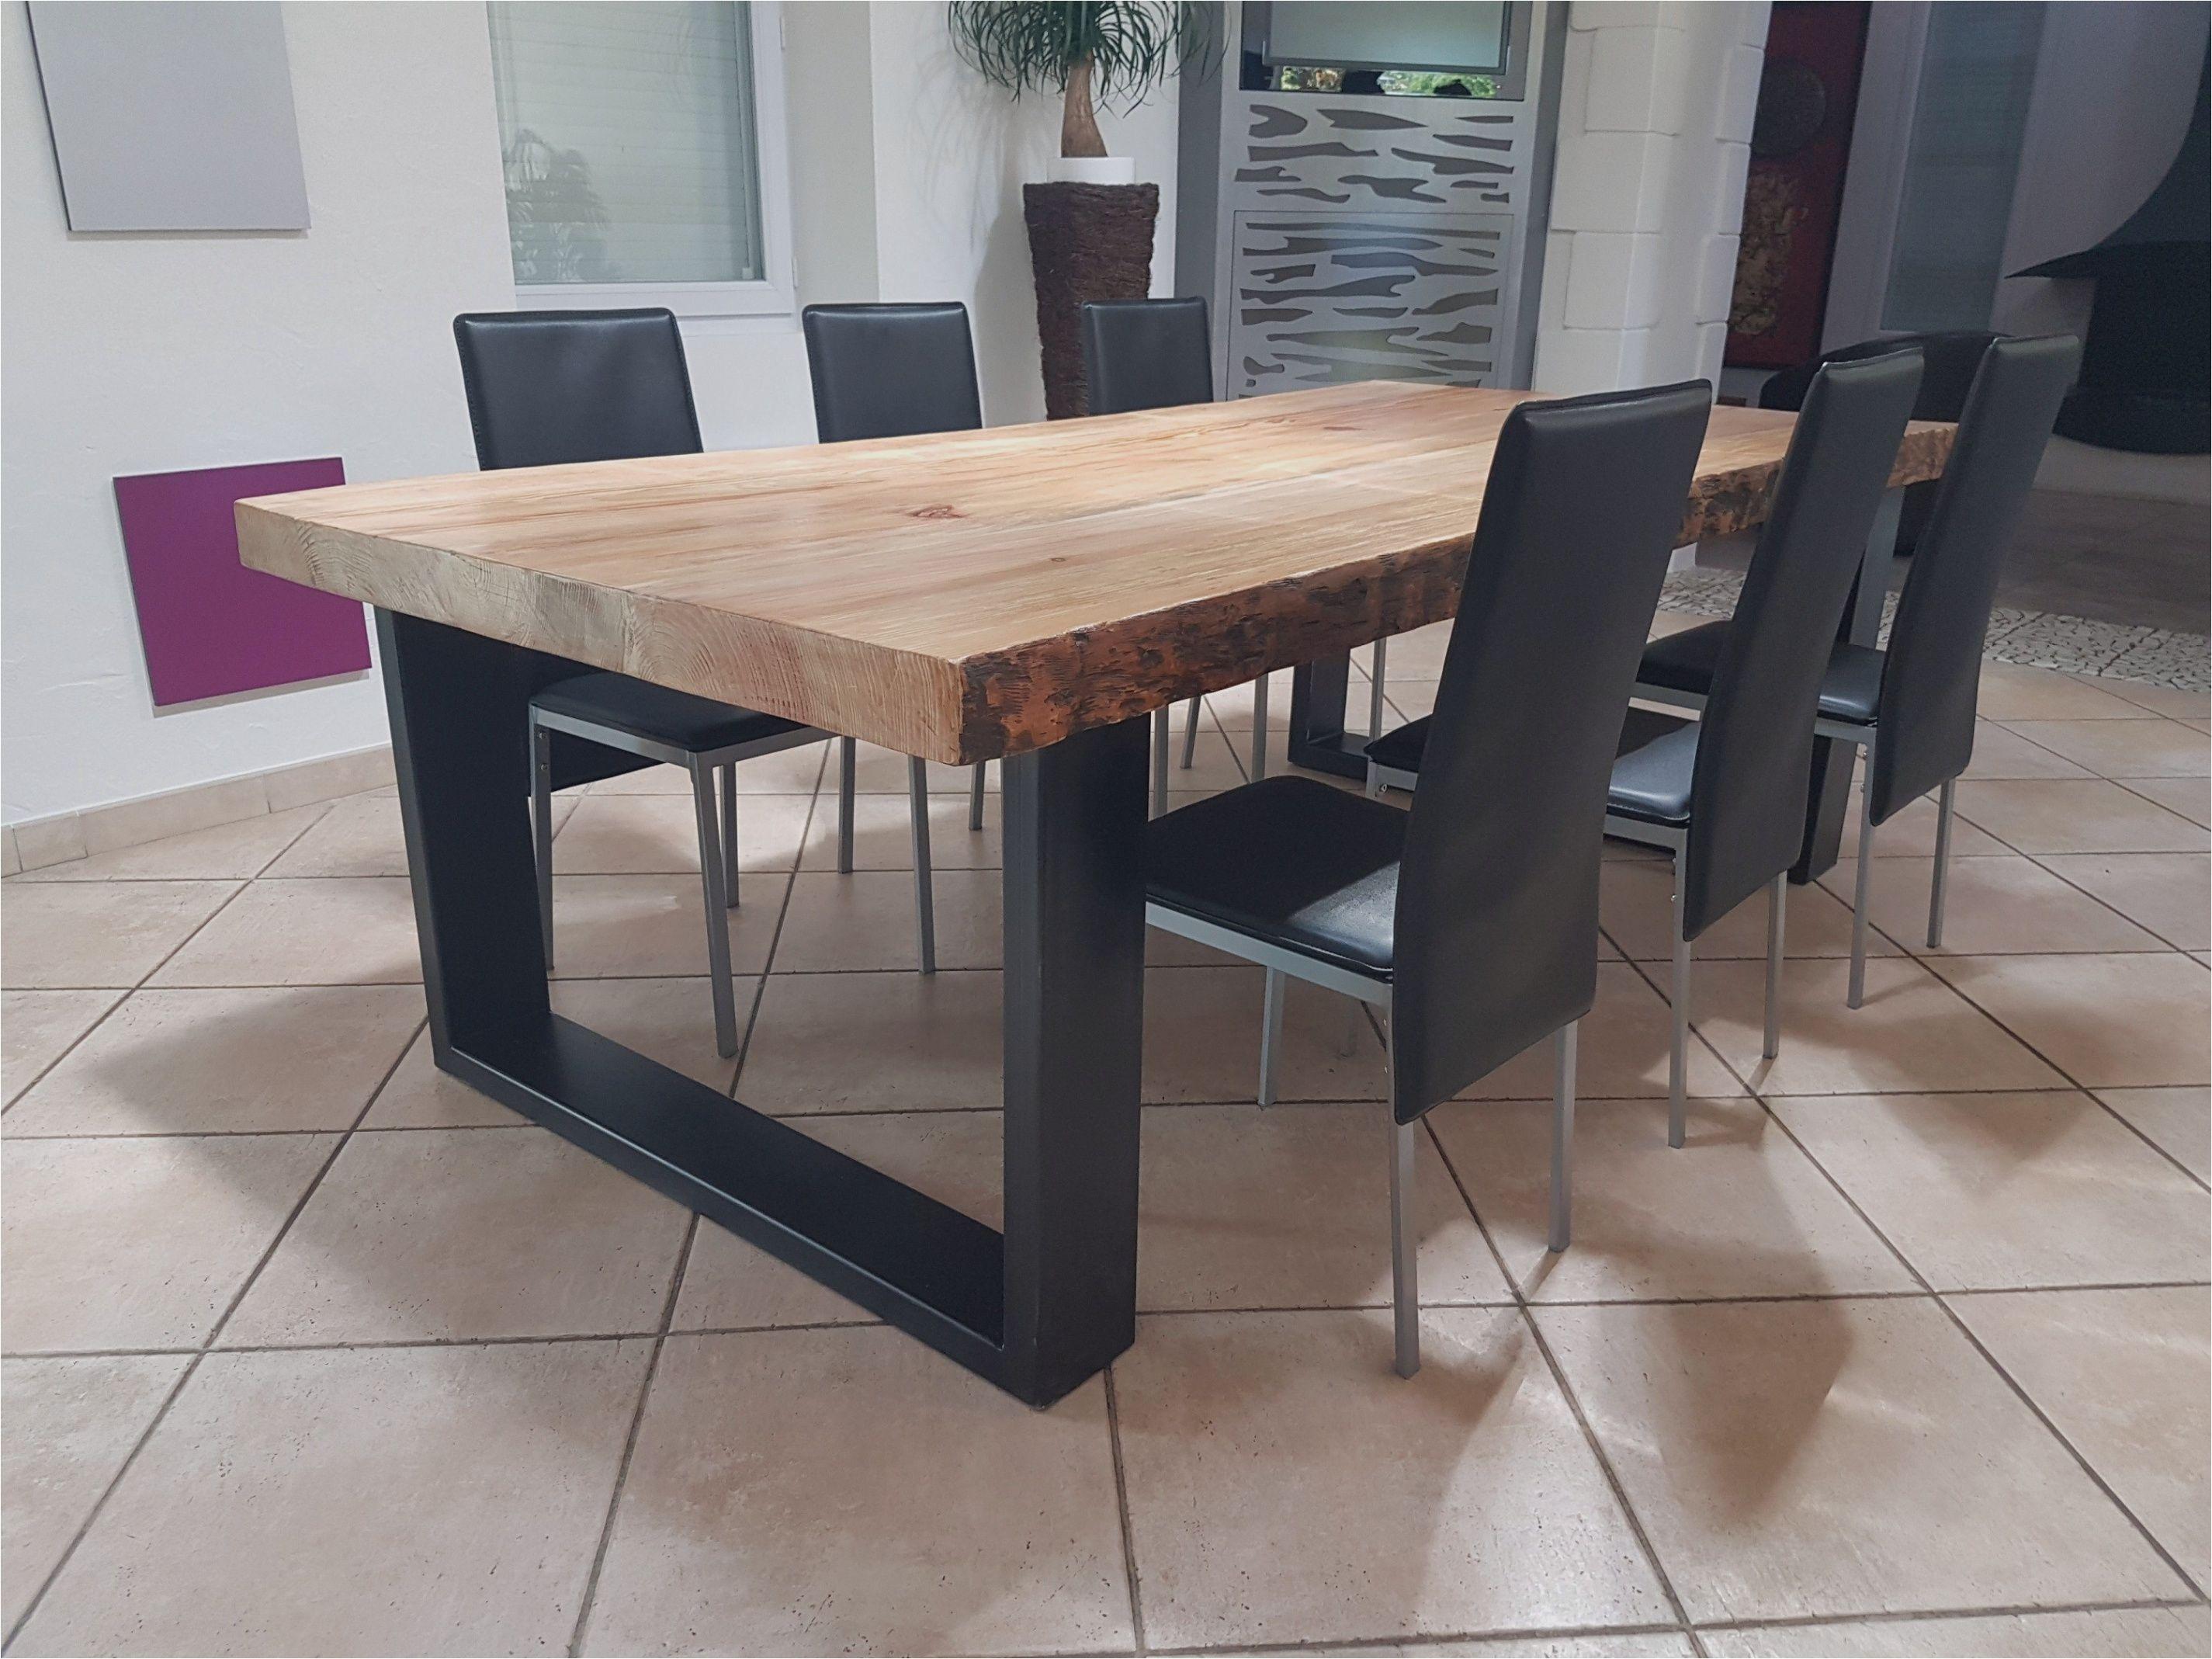 Table En Bois Chene Clair table chene clair avec rallonge - table salle a manger bois